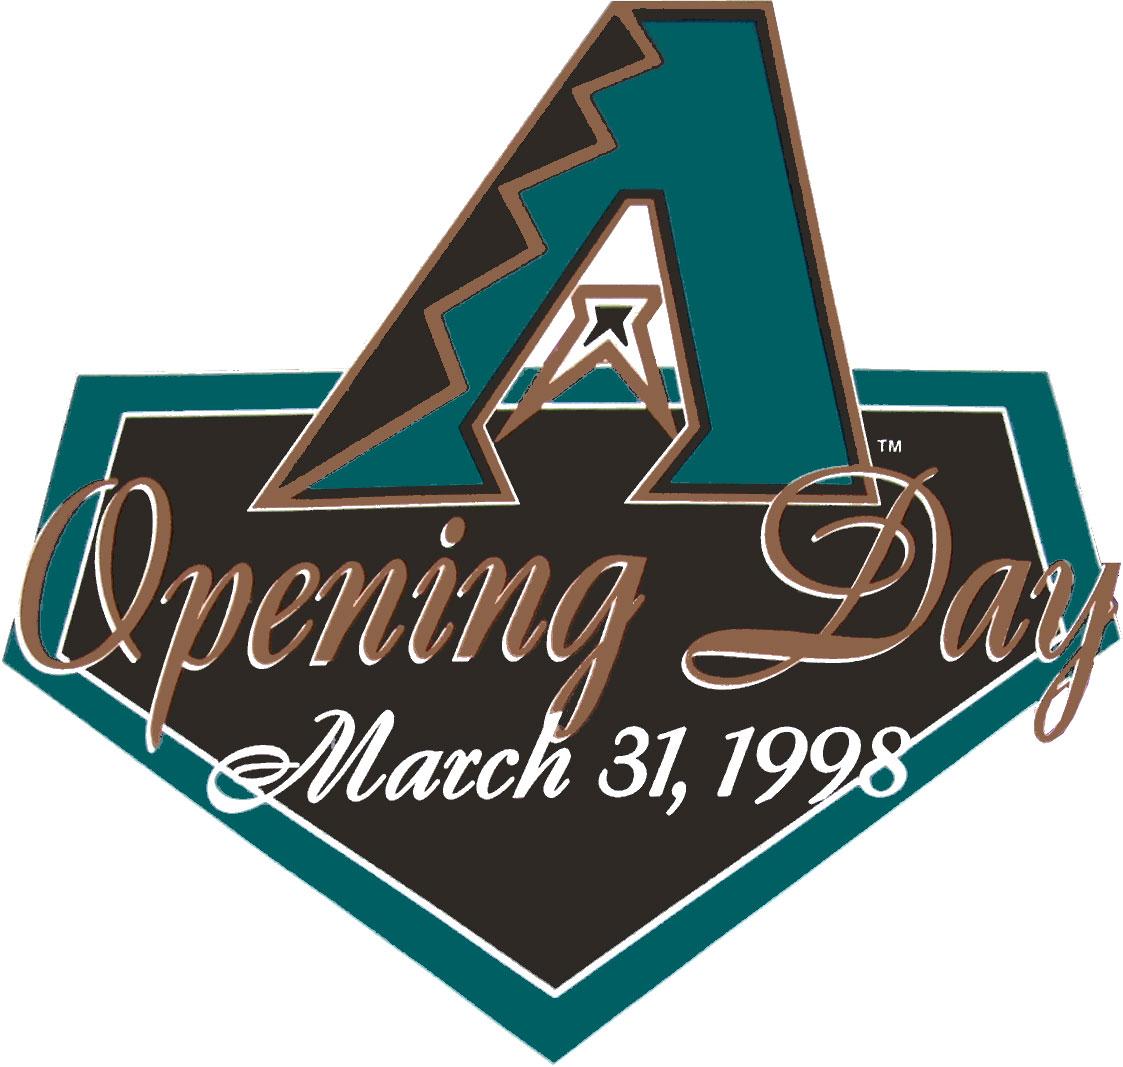 Arizona Diamondbacks Logo Special Event Logo (1998) - A above Opening Day March 31, 1998 on home plate SportsLogos.Net